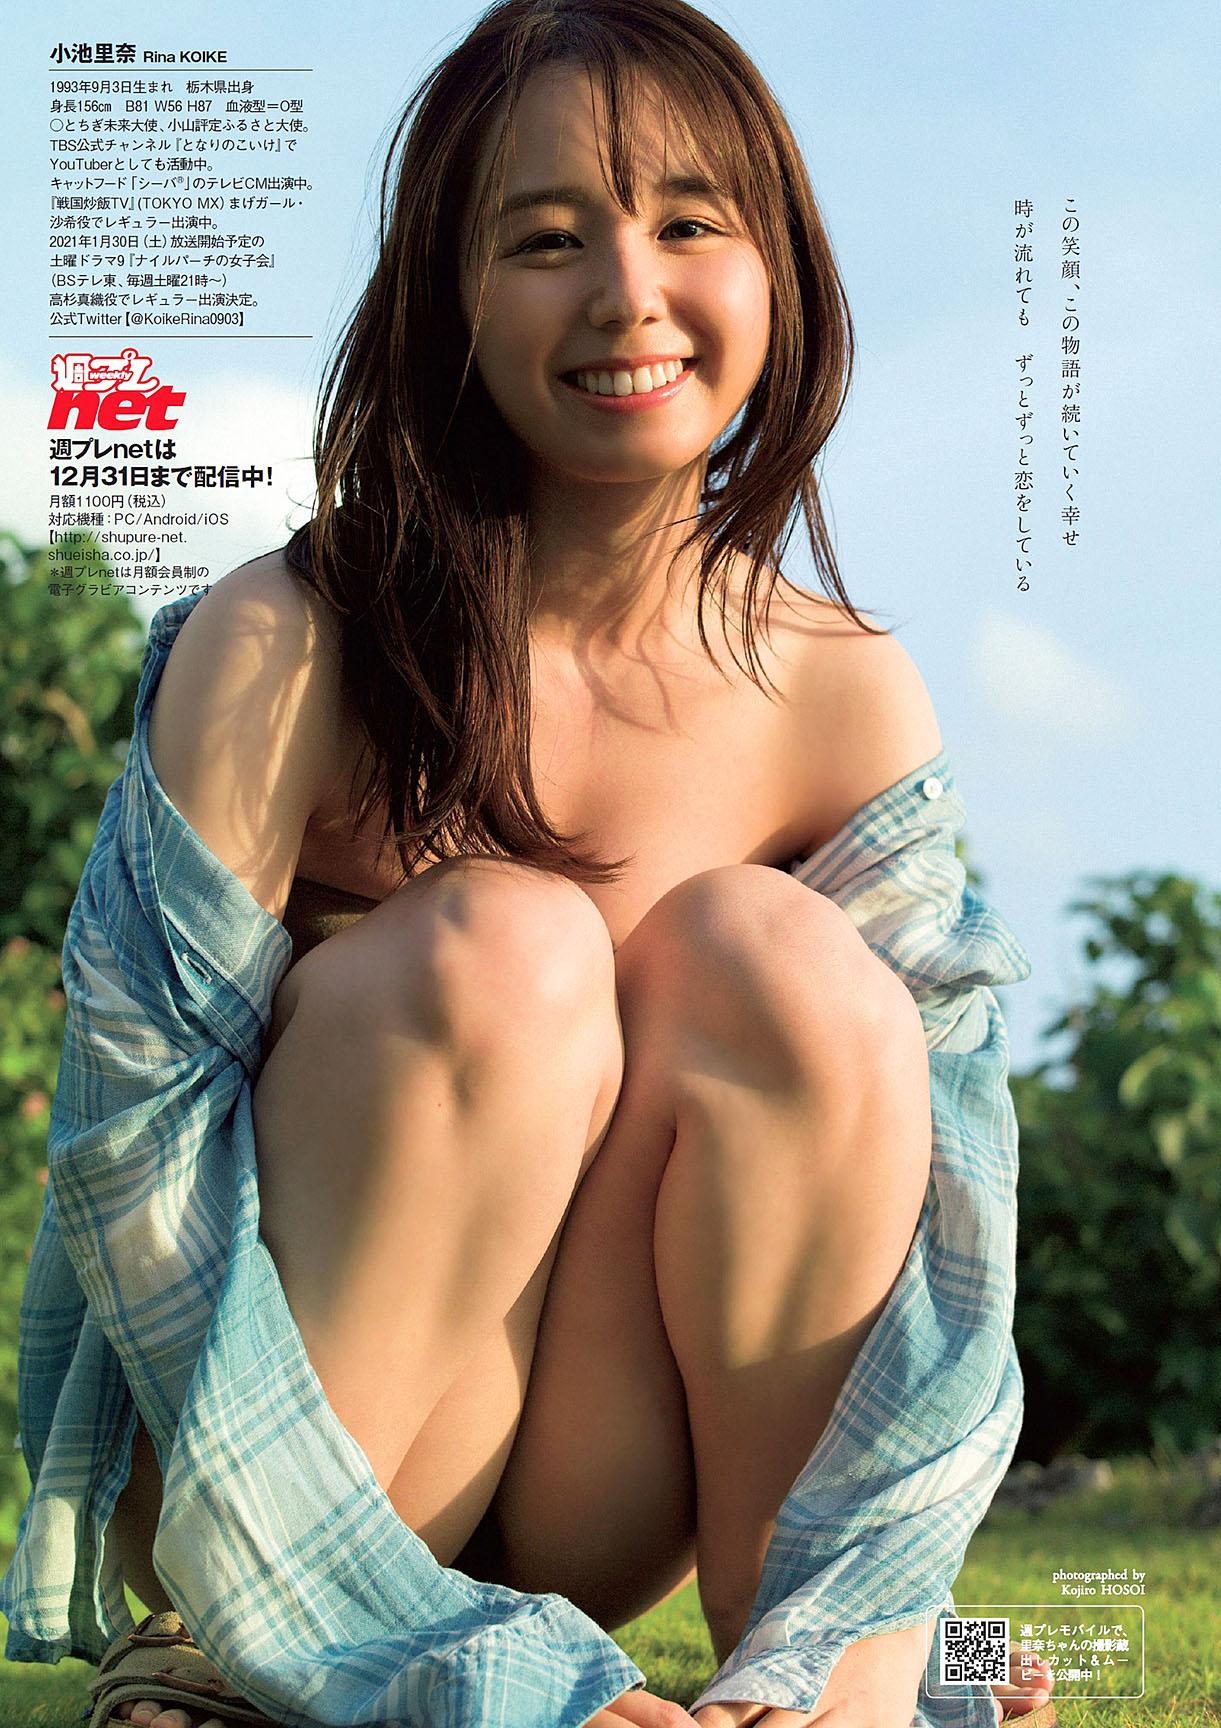 Rina Koike WPB 210111 07.jpg